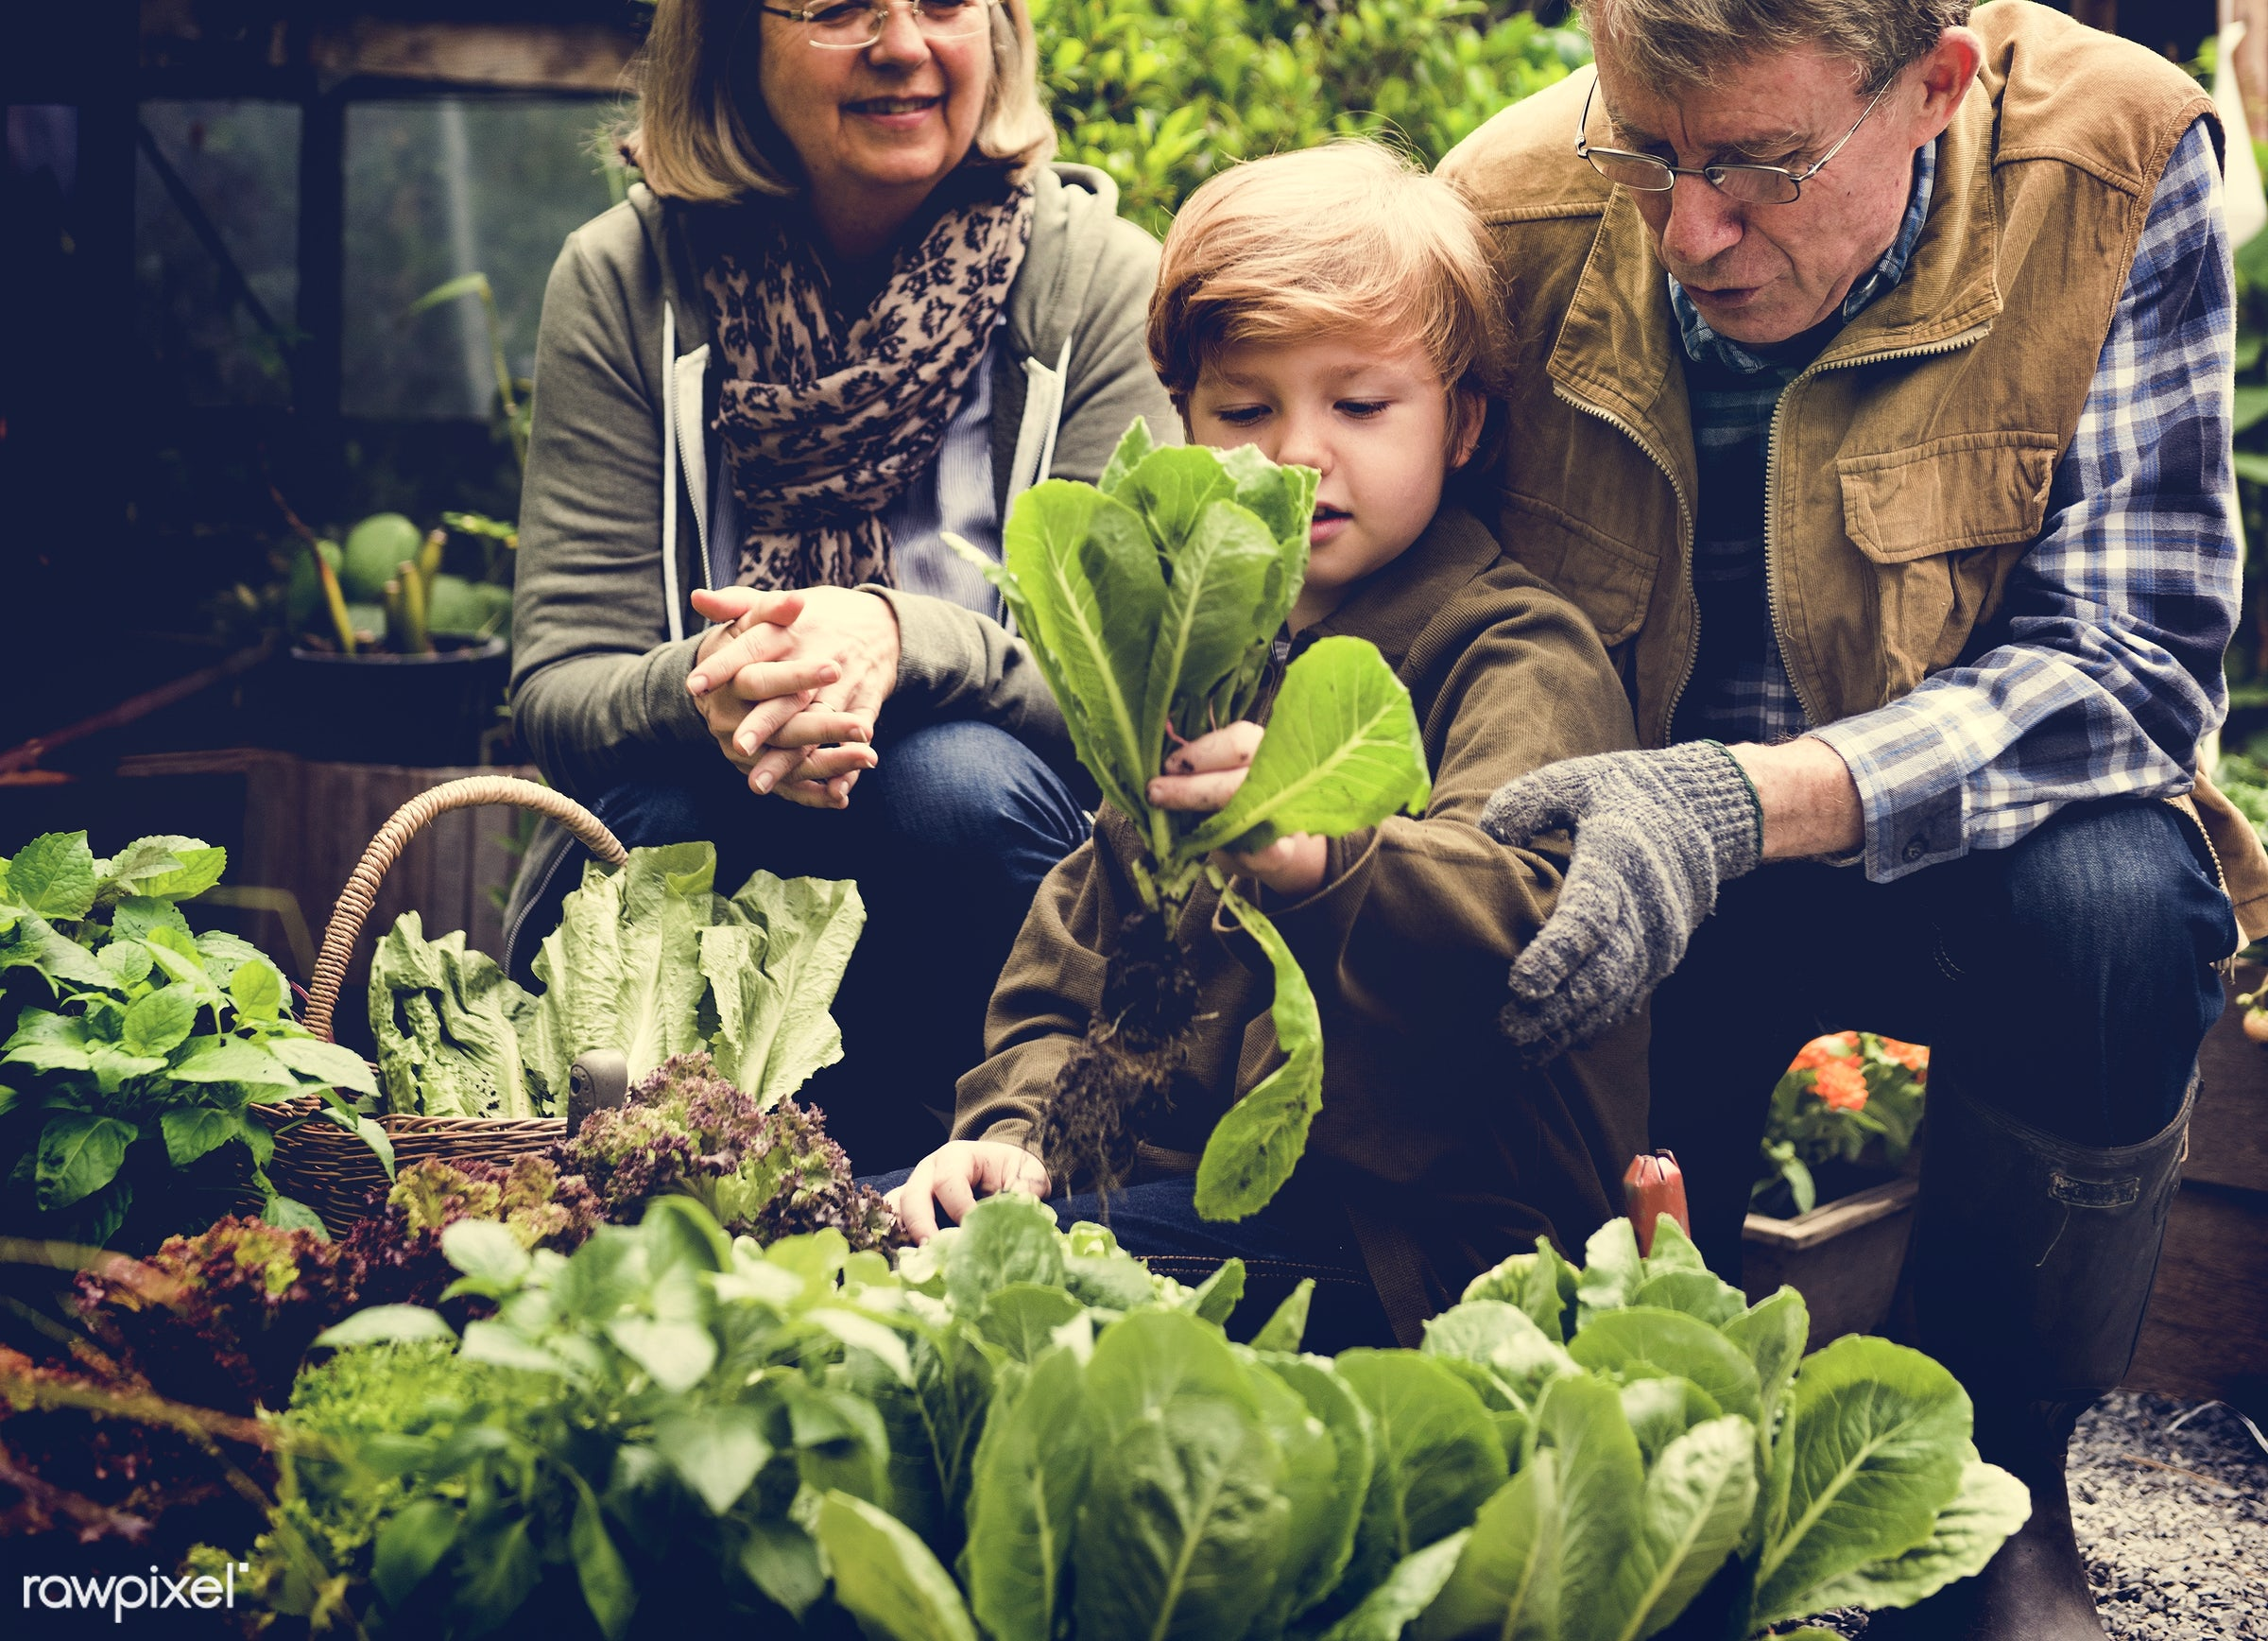 plant, nutritious, carrot, grandfather, basil, farmer, fresh, woman, lettuce, family, healthy eating, grandson, man, green,...